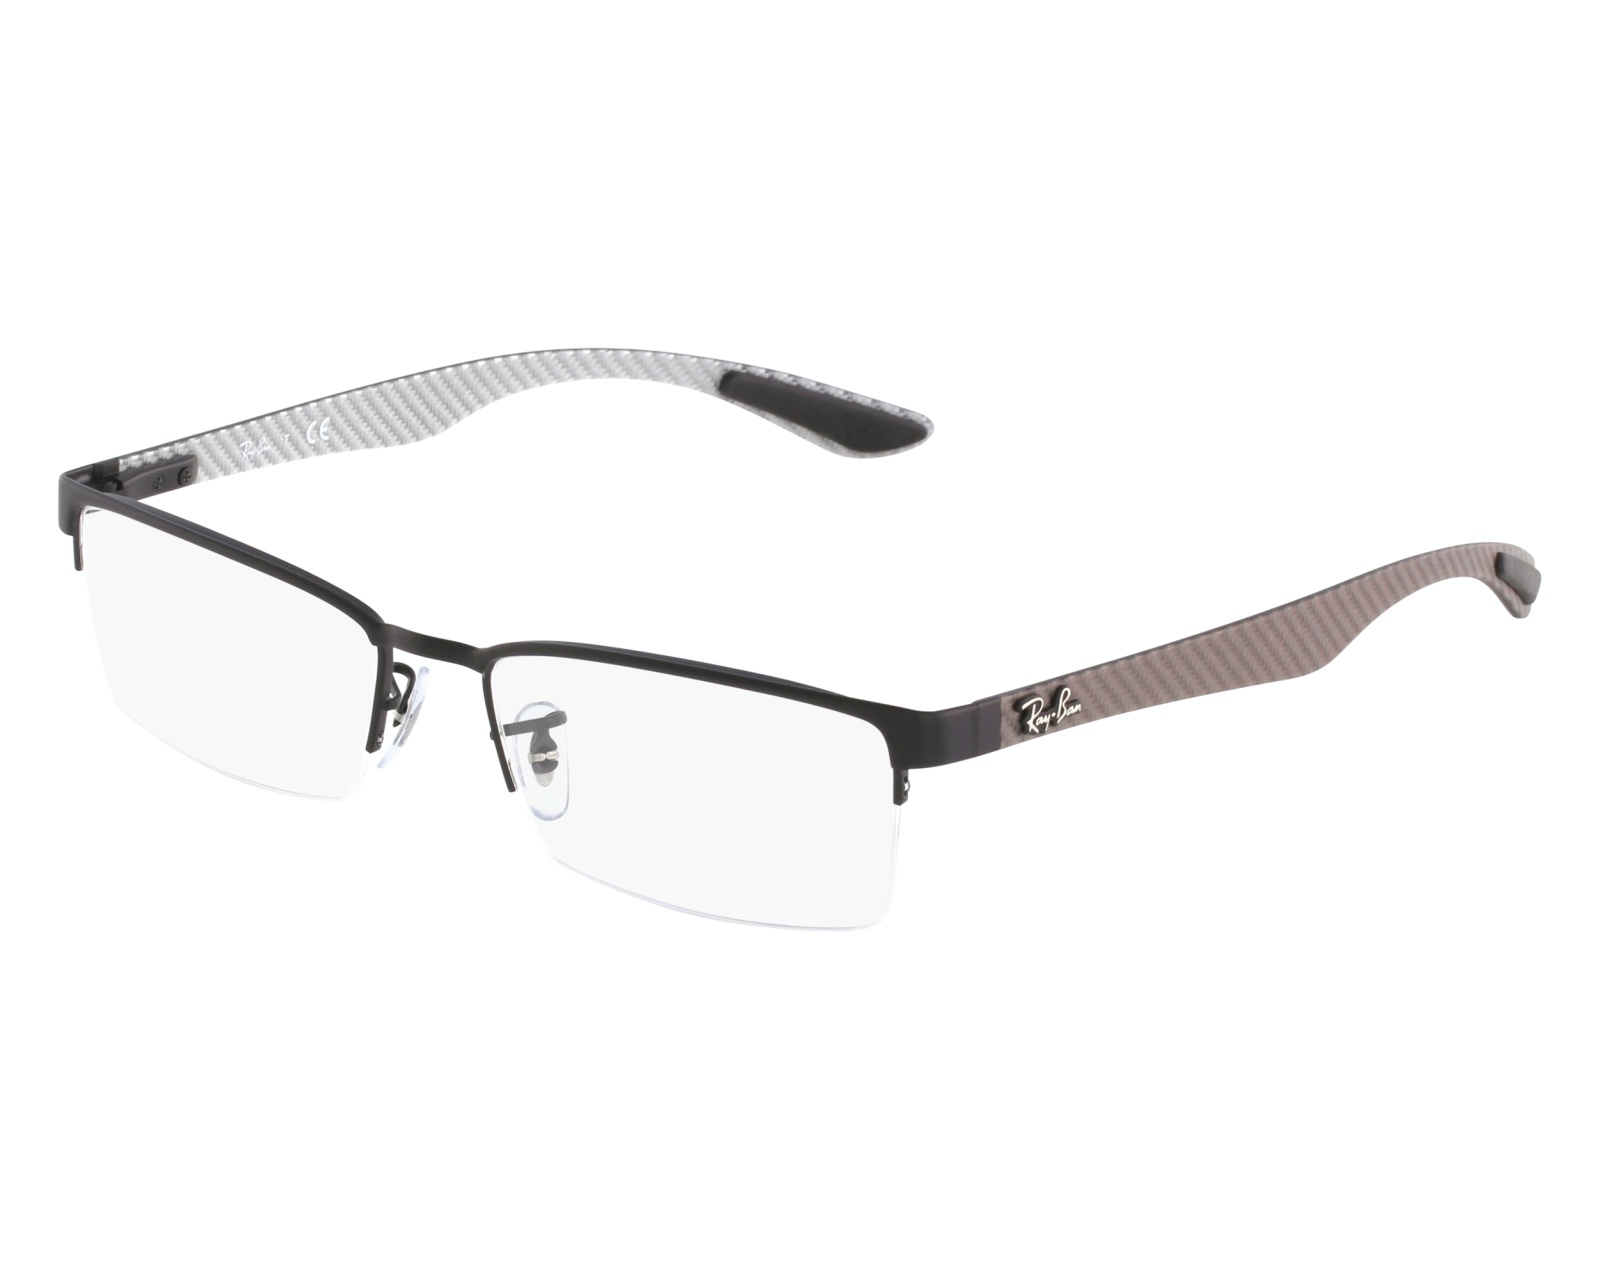 d2a397131b2 thumbnail eyeglasses Ray-Ban RX-8412 2503 52-17 Black front view